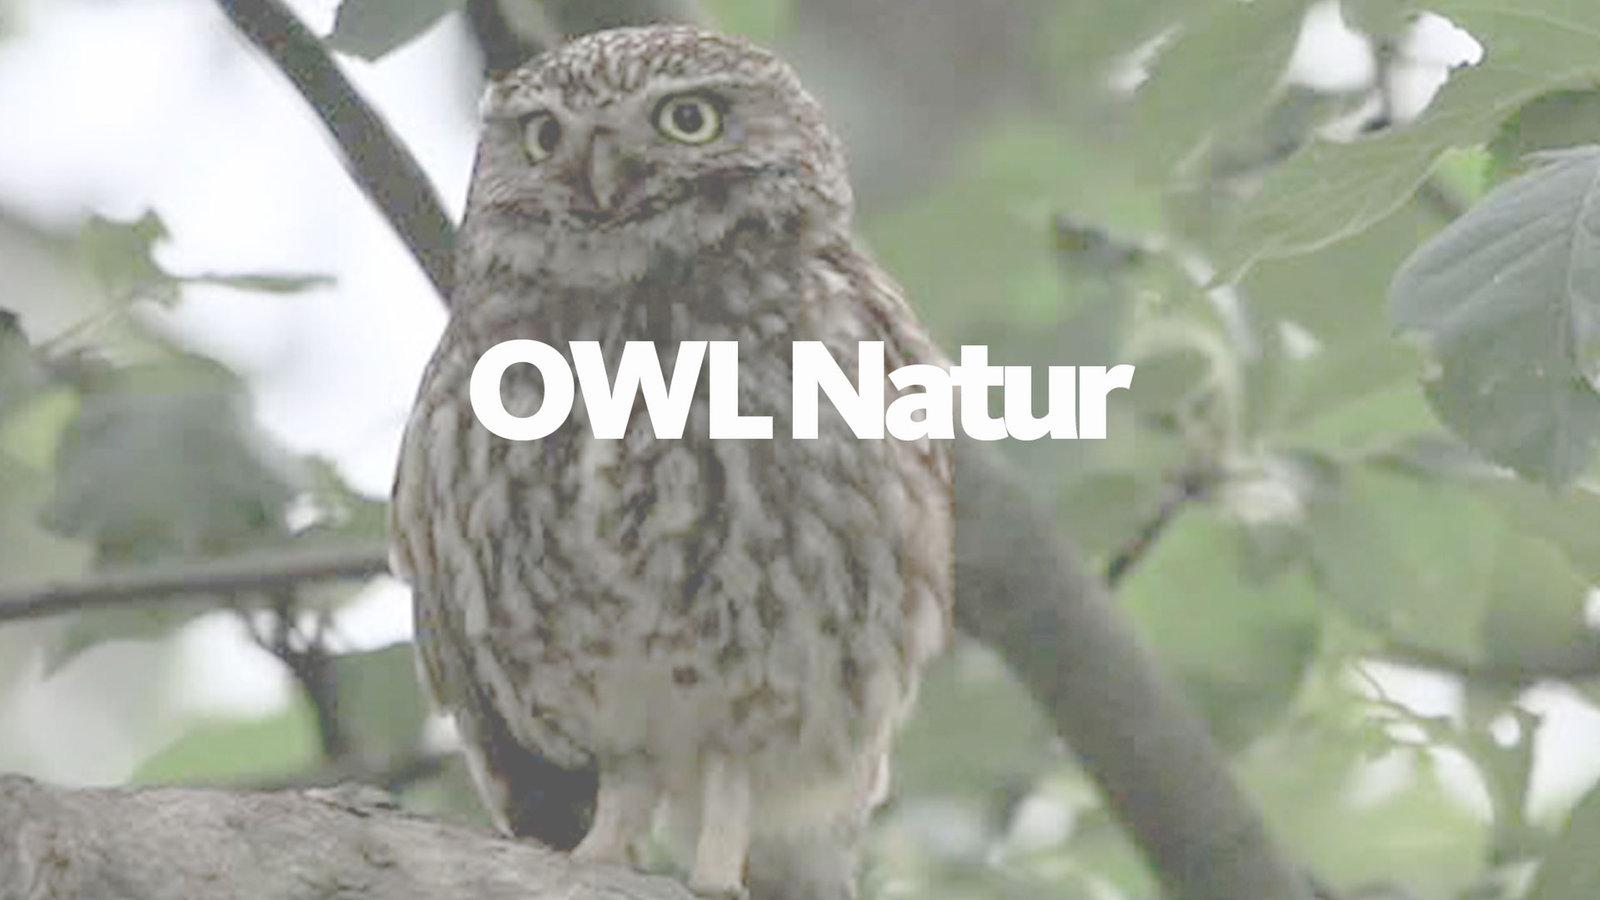 Wdr Owl Mediathek